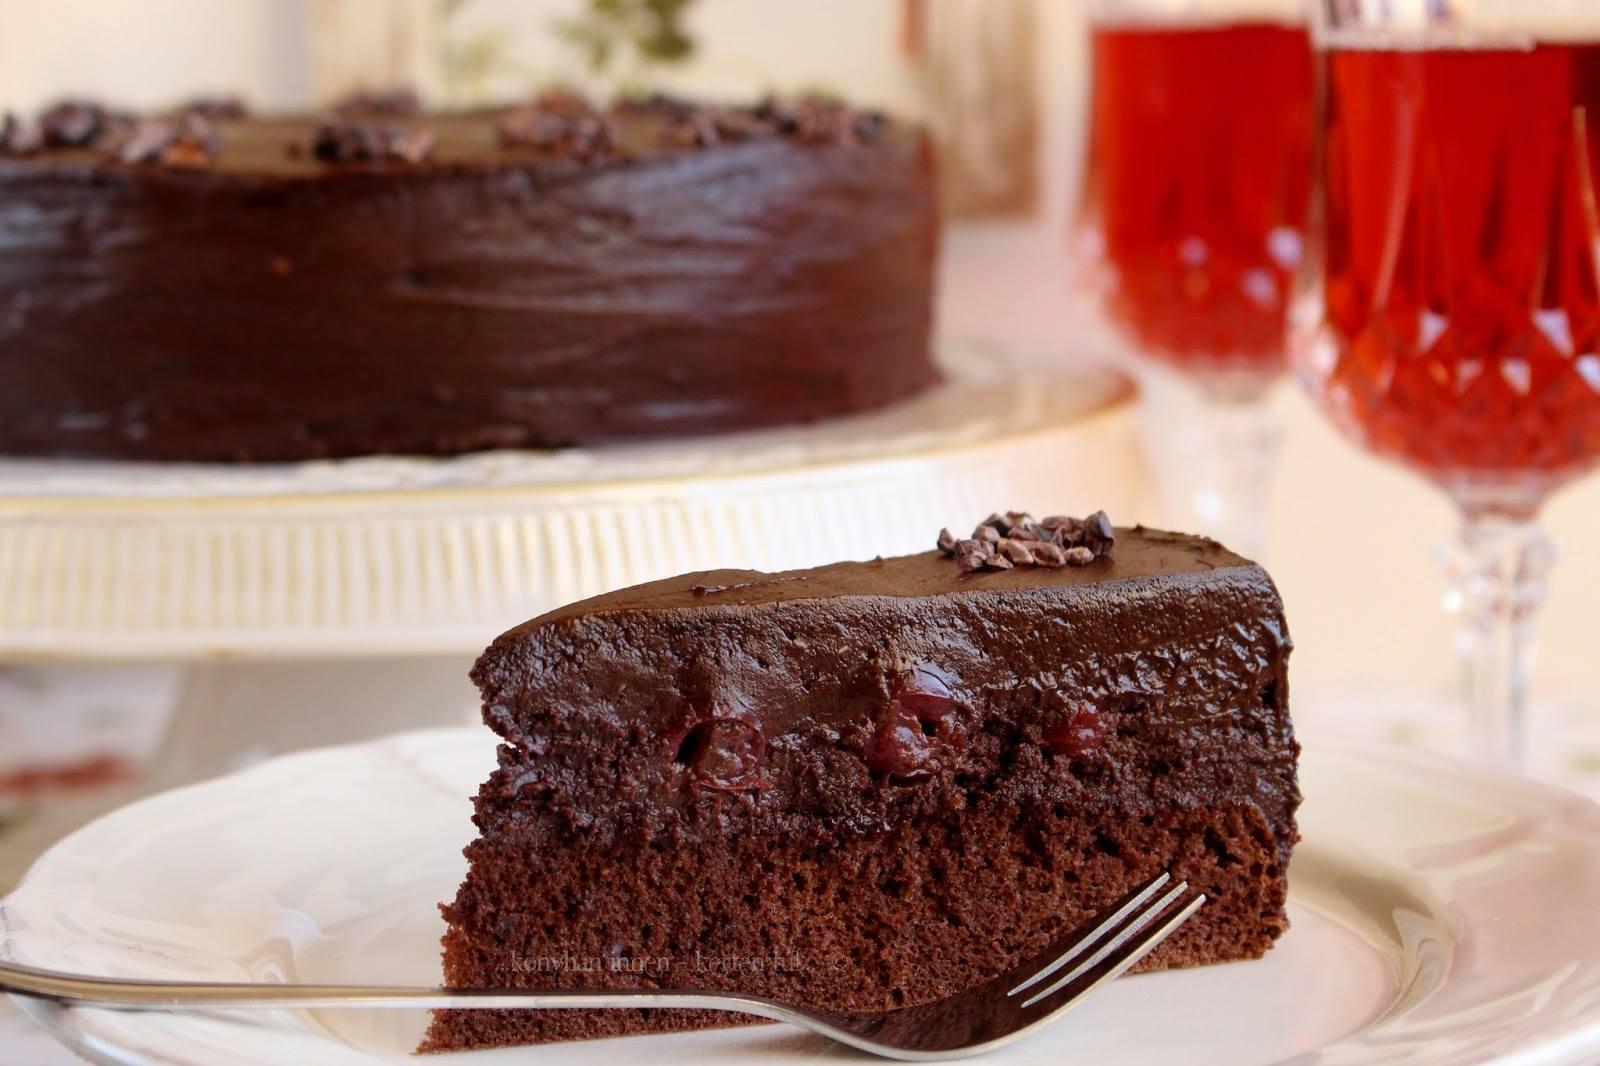 lúdláb, dessert, recipe